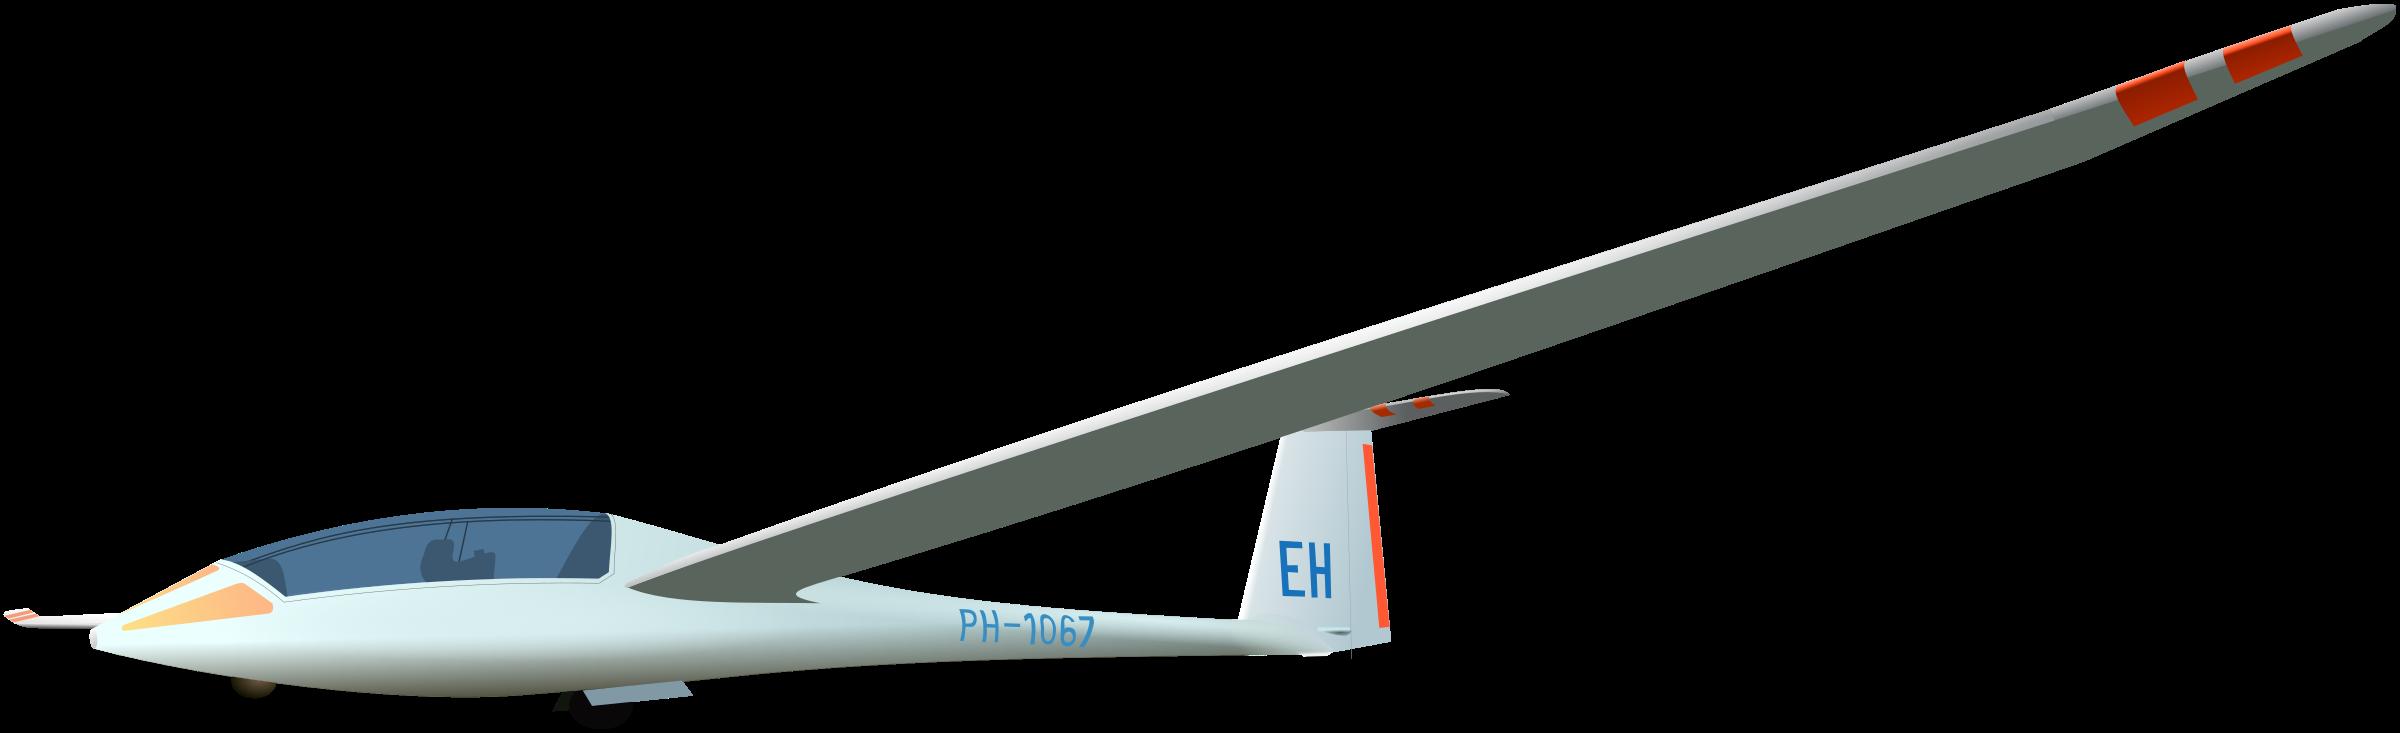 Glider PNG File.